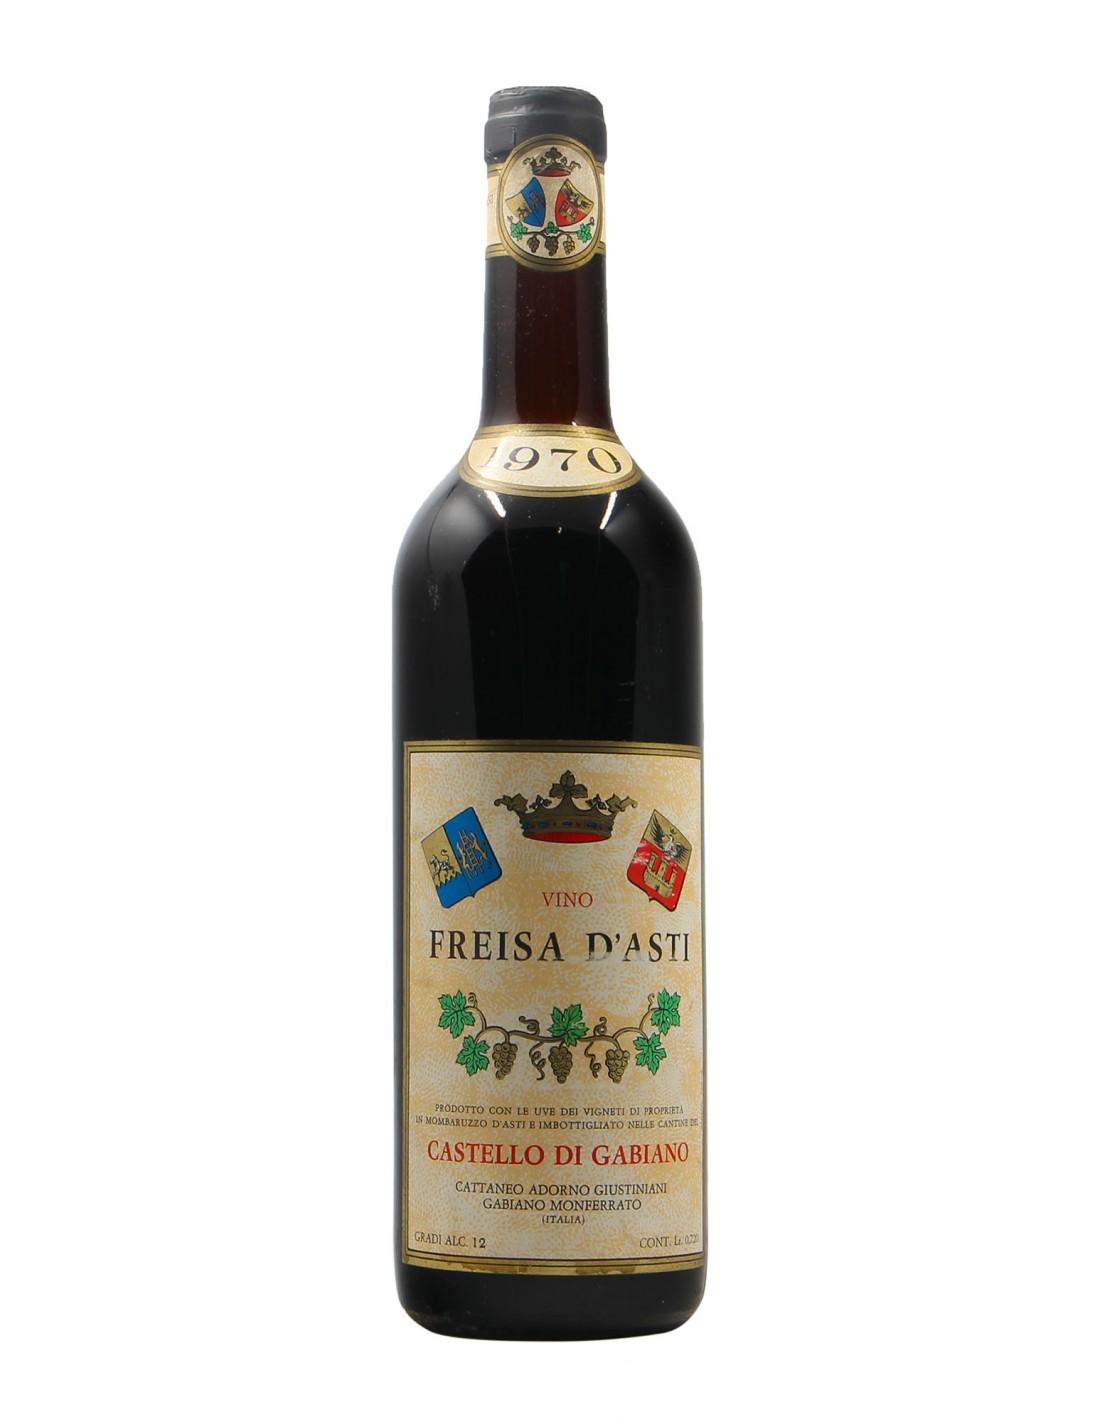 FREISA CASTELLO DI GABIANO 1970 GIUSTINIANI Grandi Bottiglie